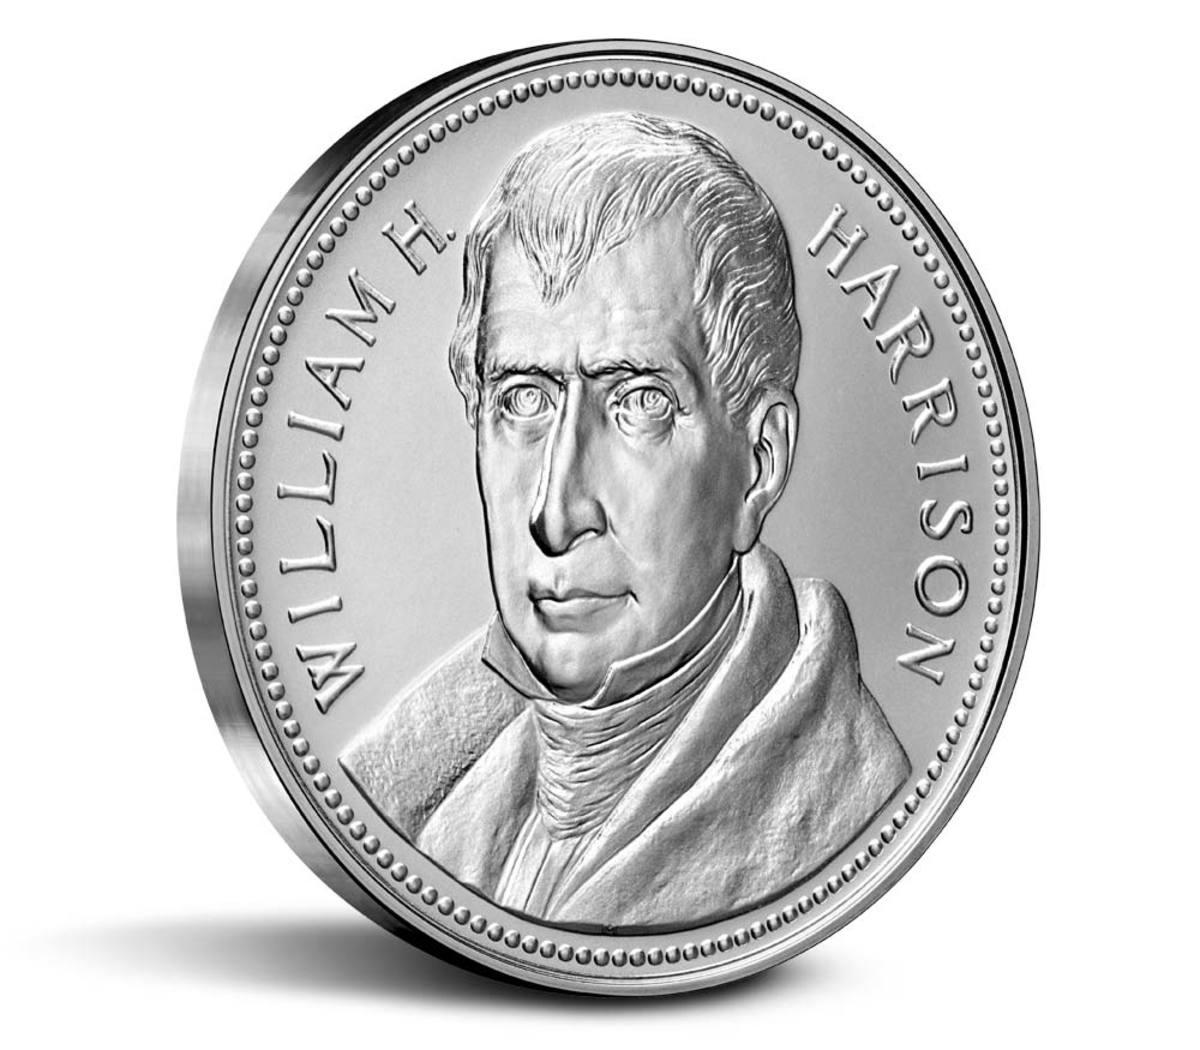 William H. Harrison Presidential medal. (Image courtesy U.S. Mint.)